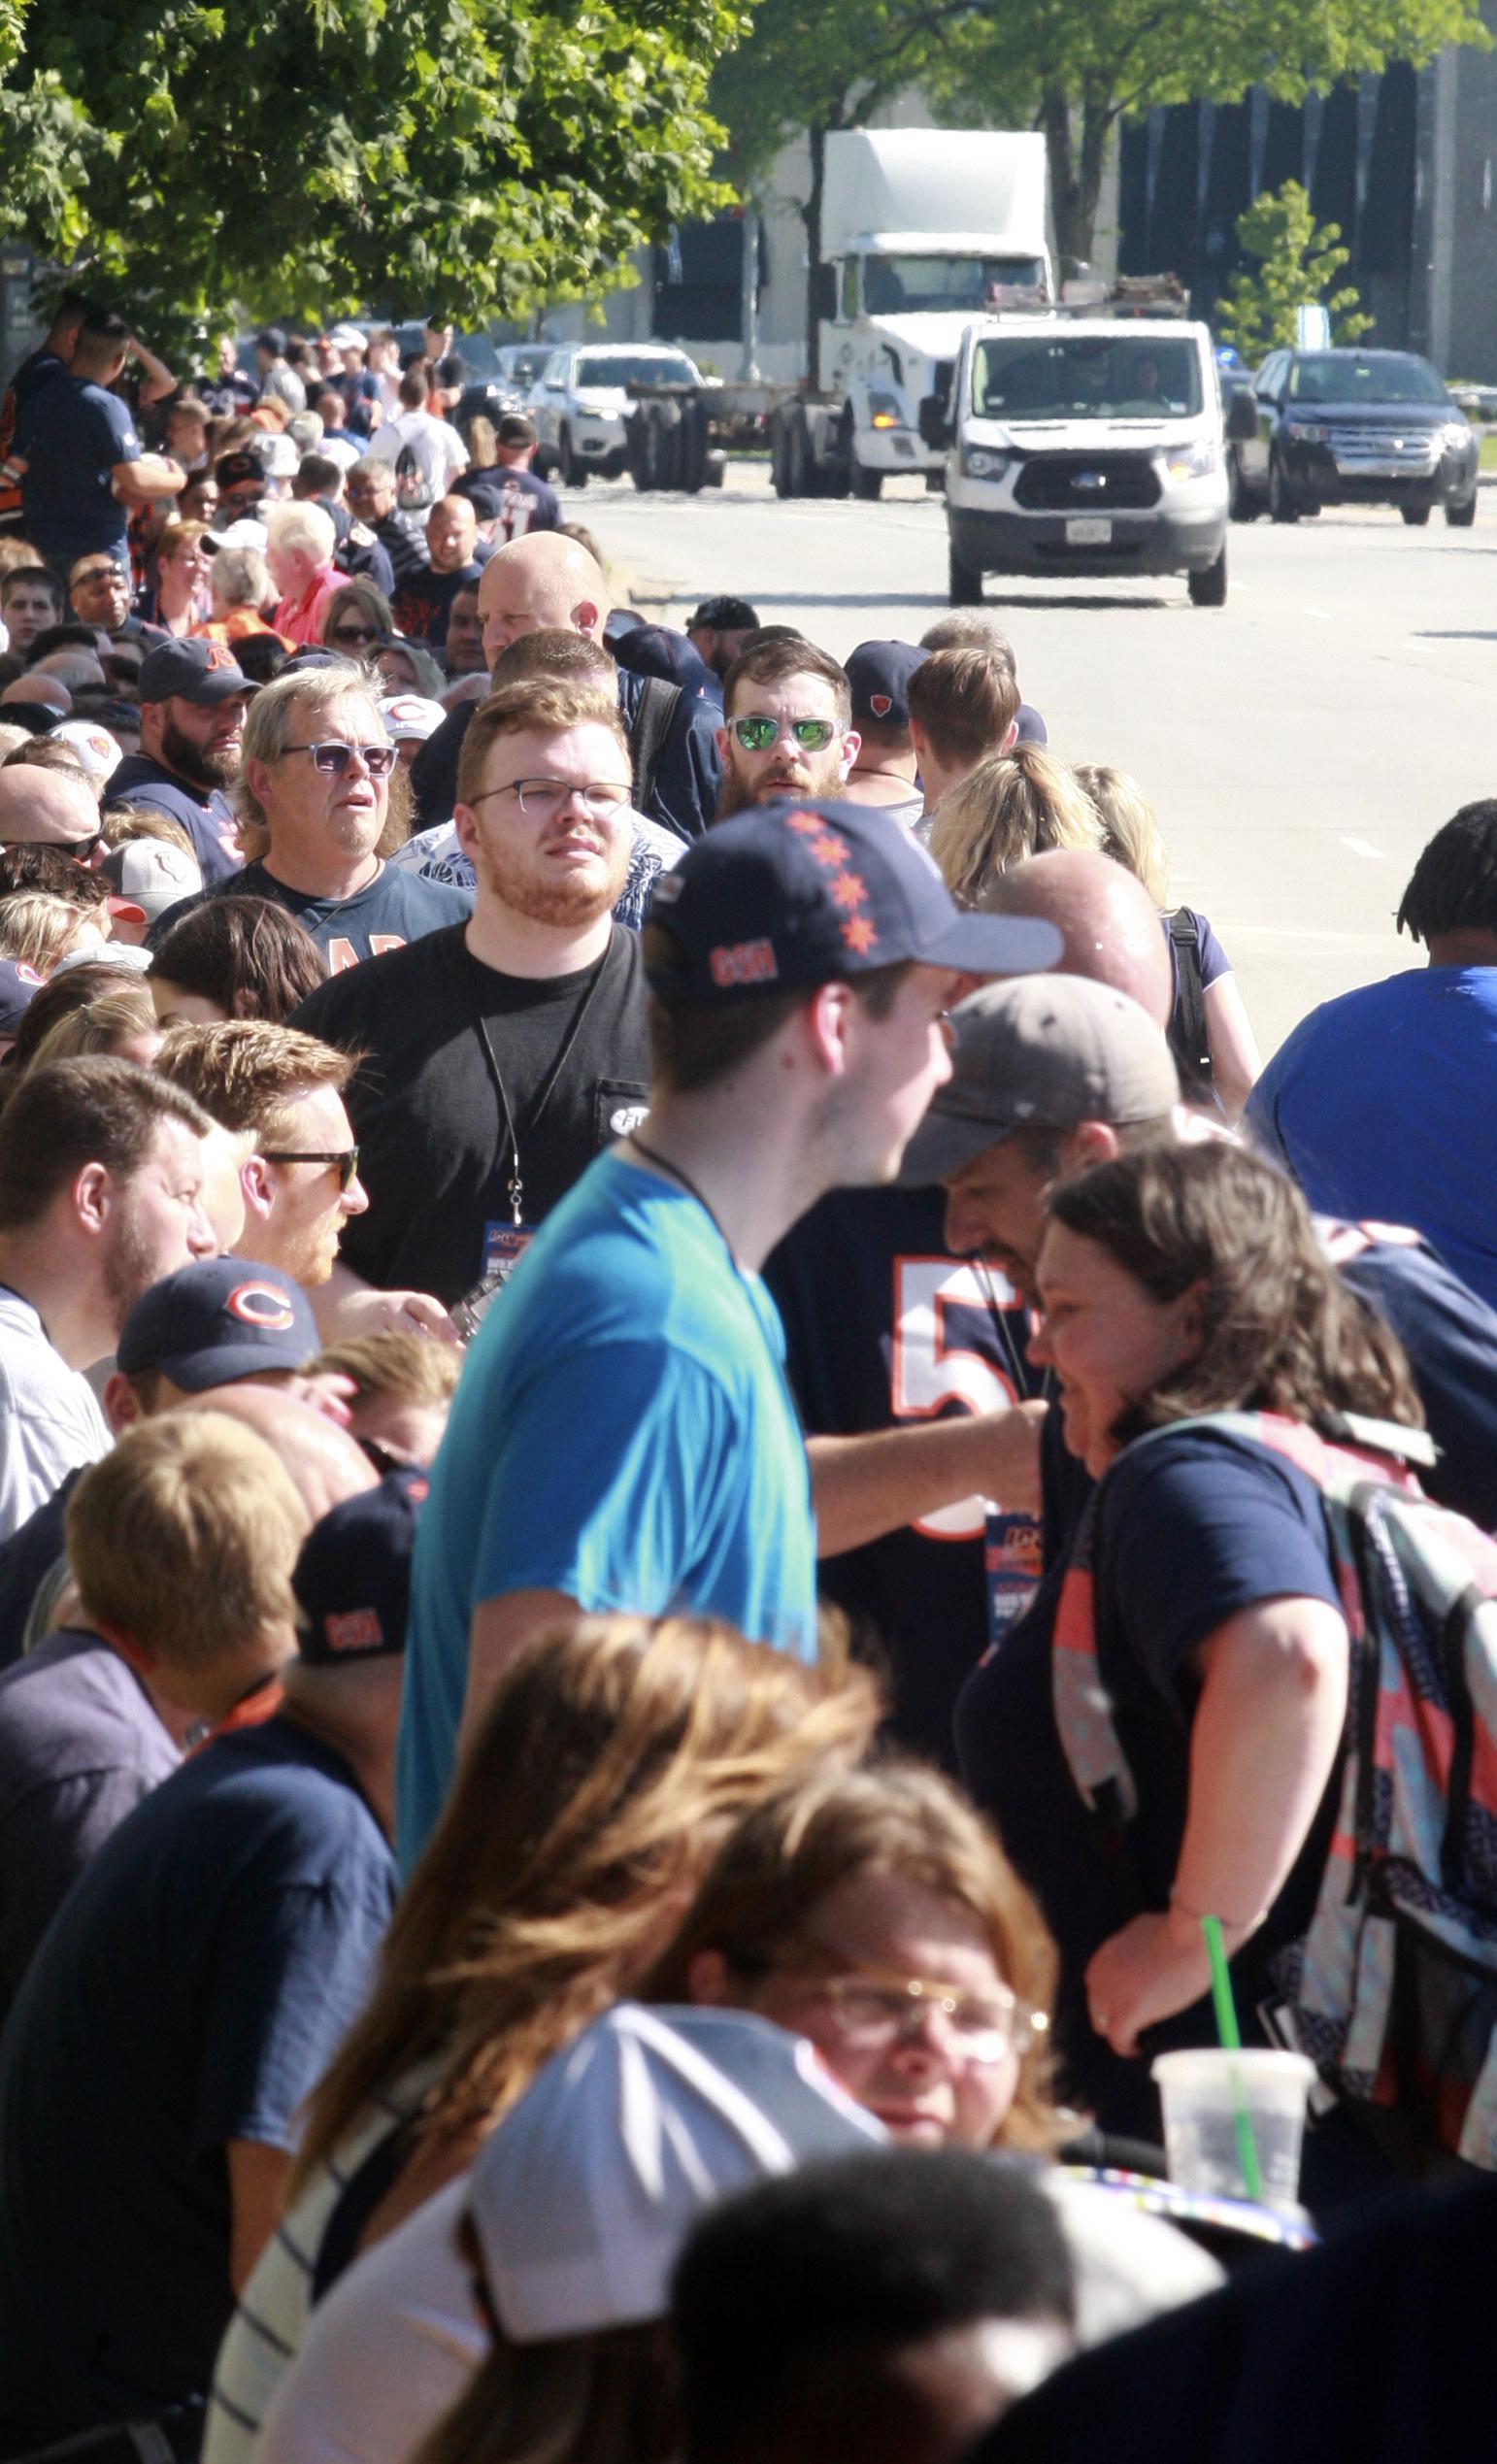 buy popular 9e611 adf5b Bears, Fans Flock To Rosemont For Team Centennial